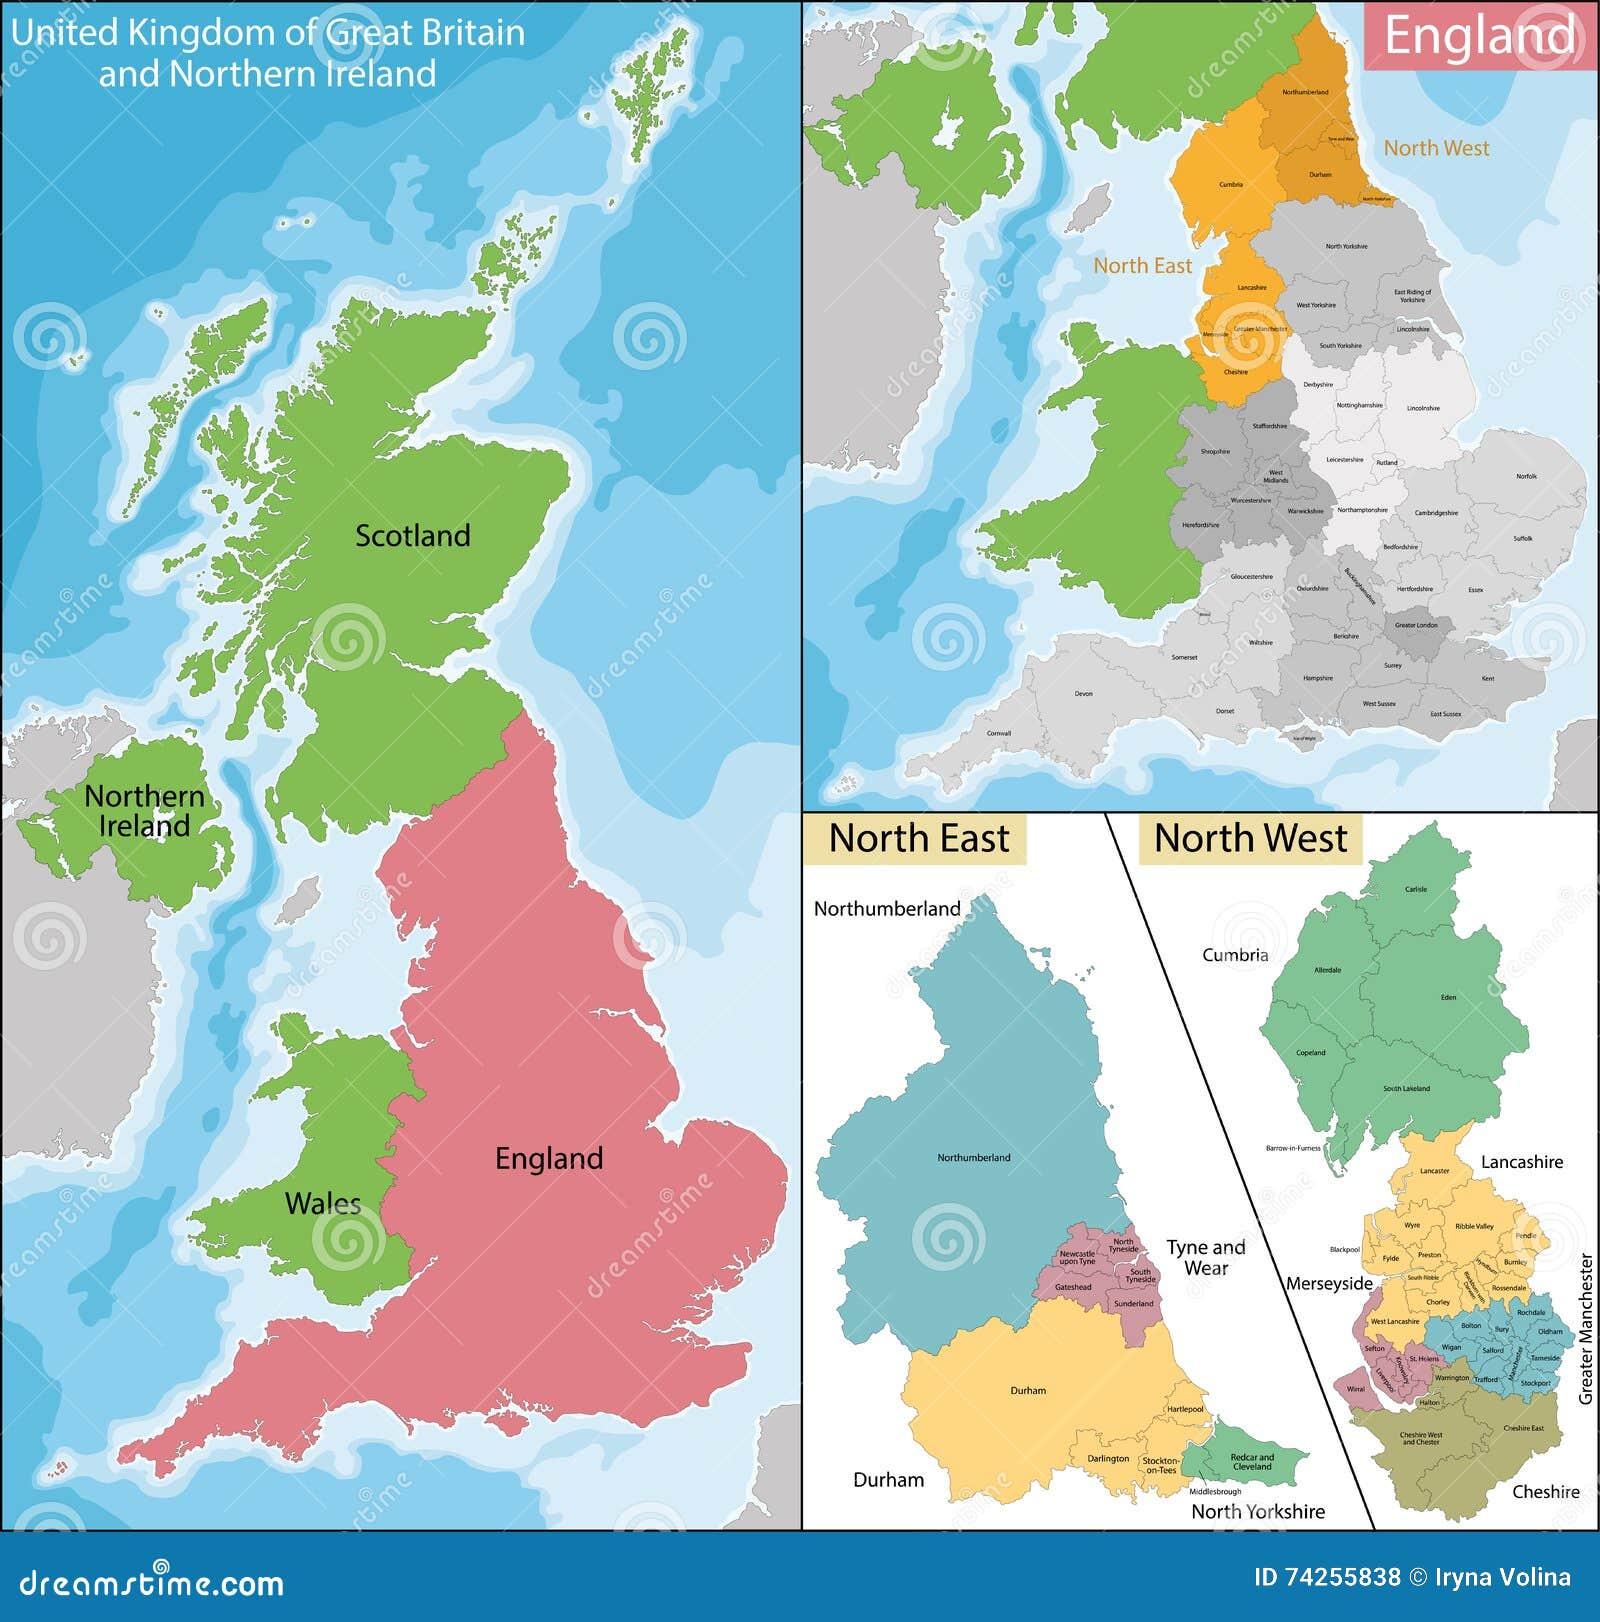 Carte Dangleterre.Carte De L Angleterre D Est Et Occidentale Du Nord Illustration De